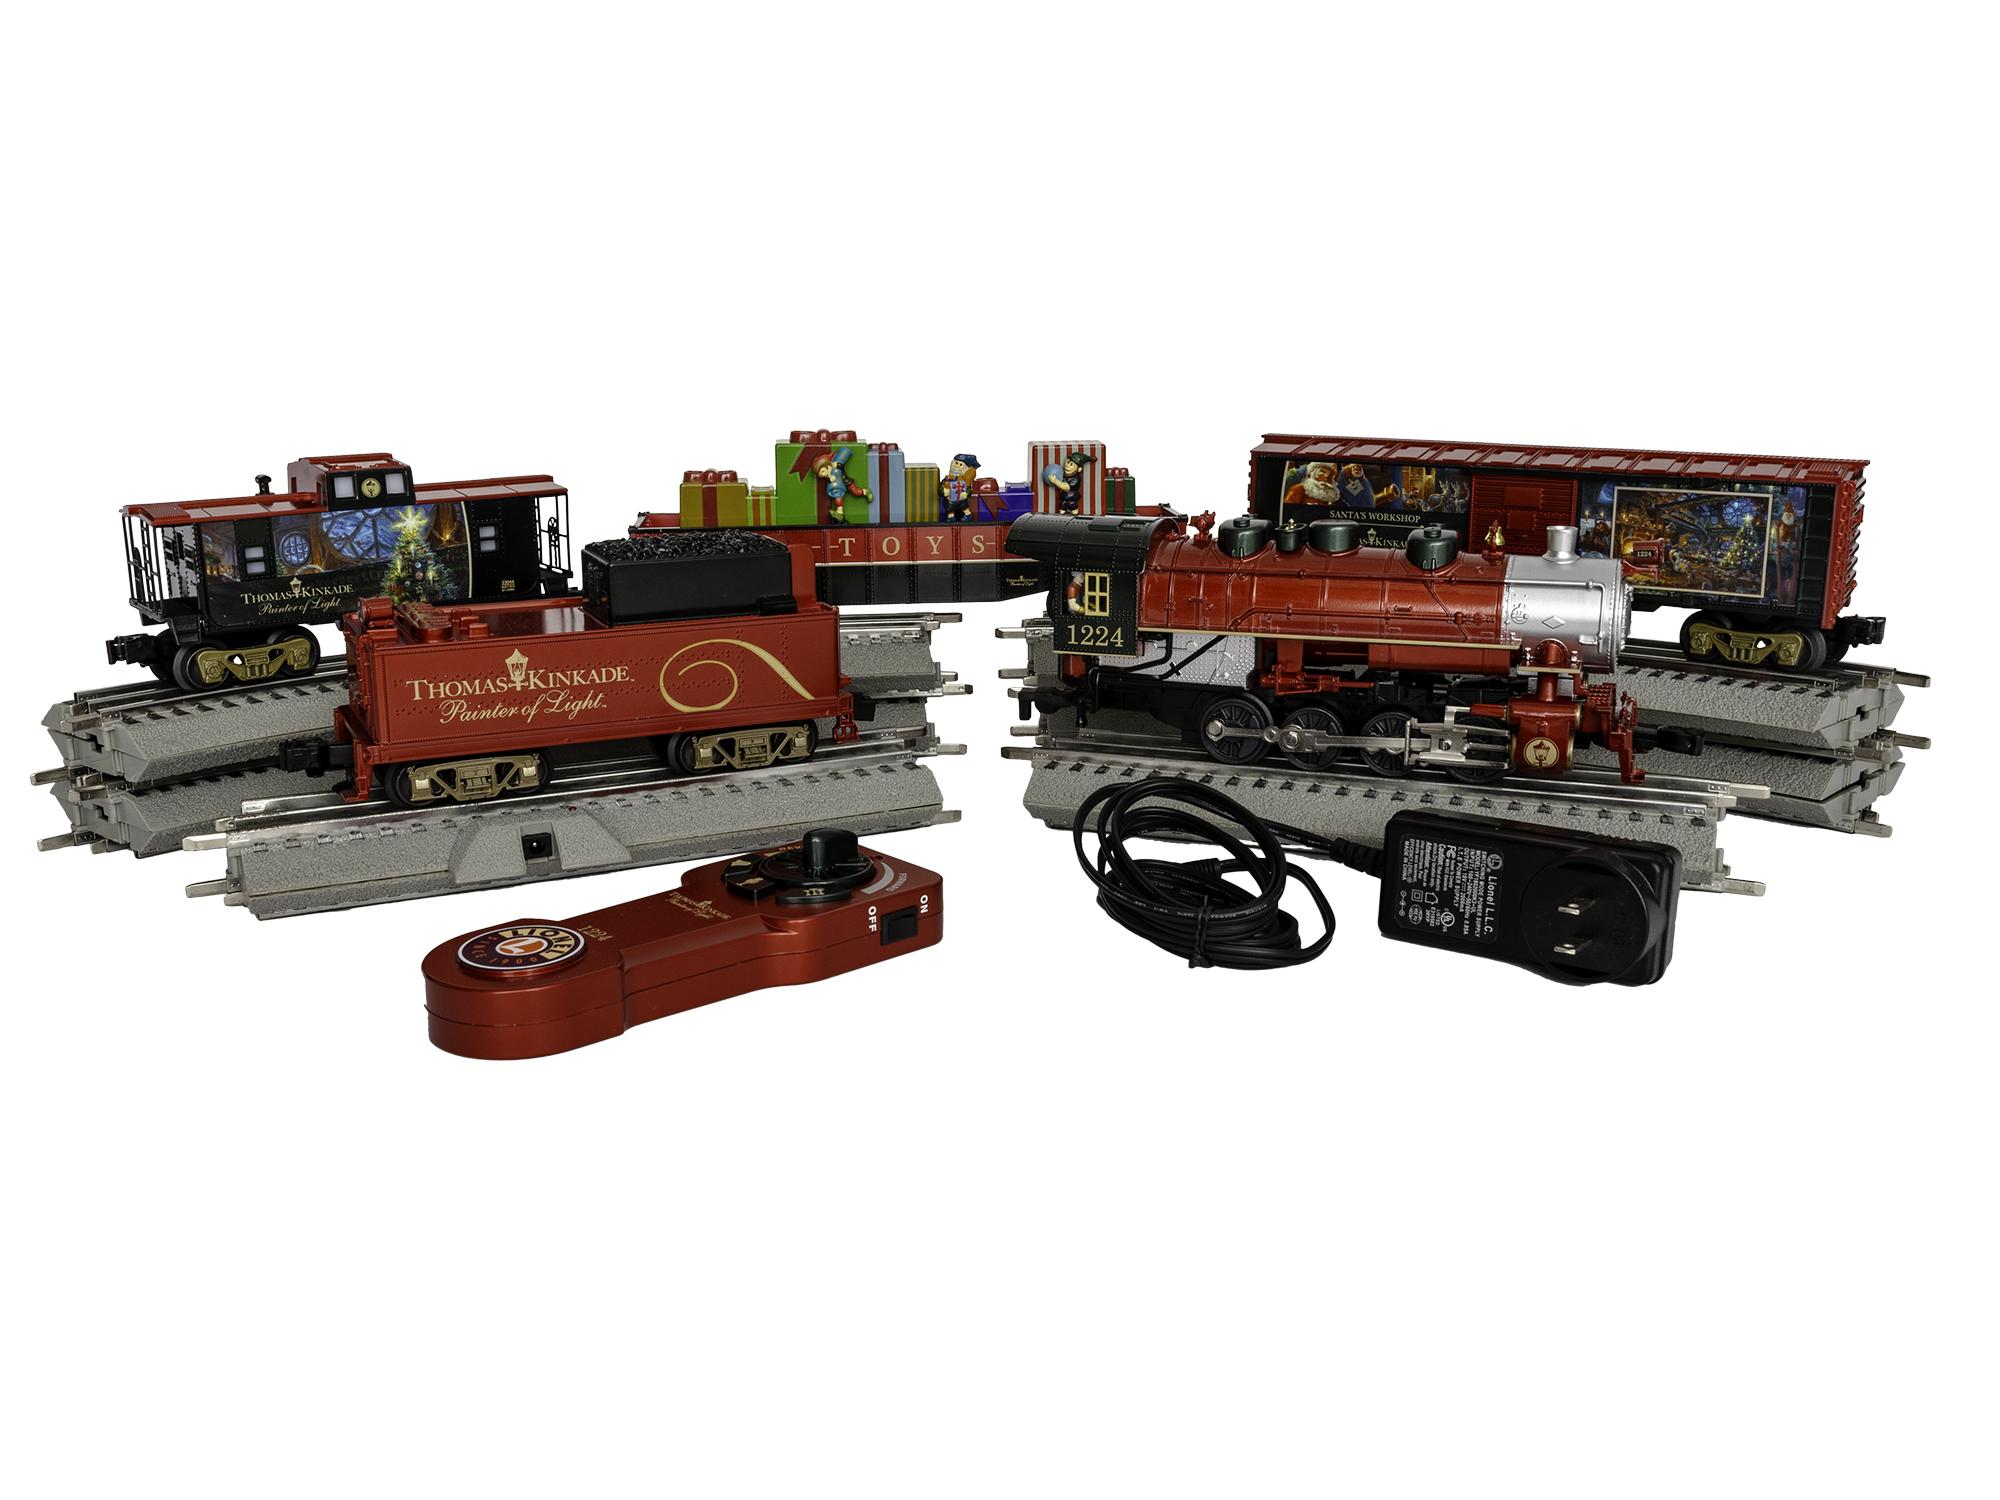 Lionel Thomas Kinkade Electric O Gauge Model Train Set w// Remote and Bluetooth Capability